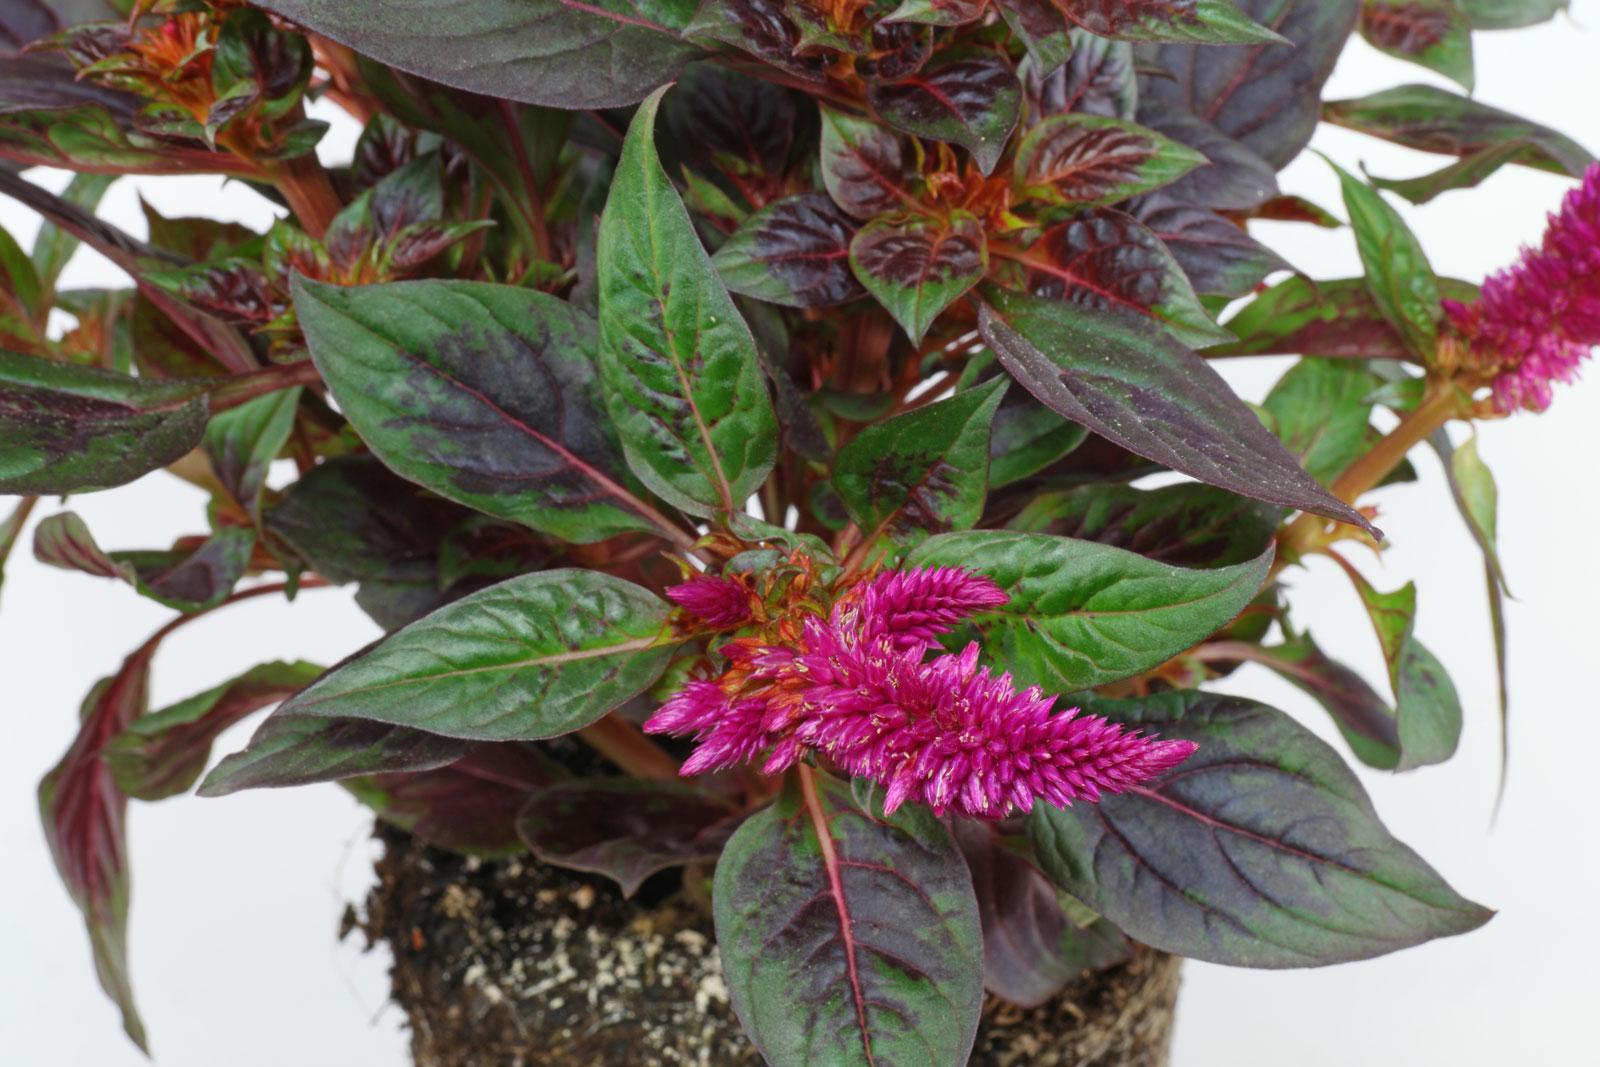 Celosia argentea Camina